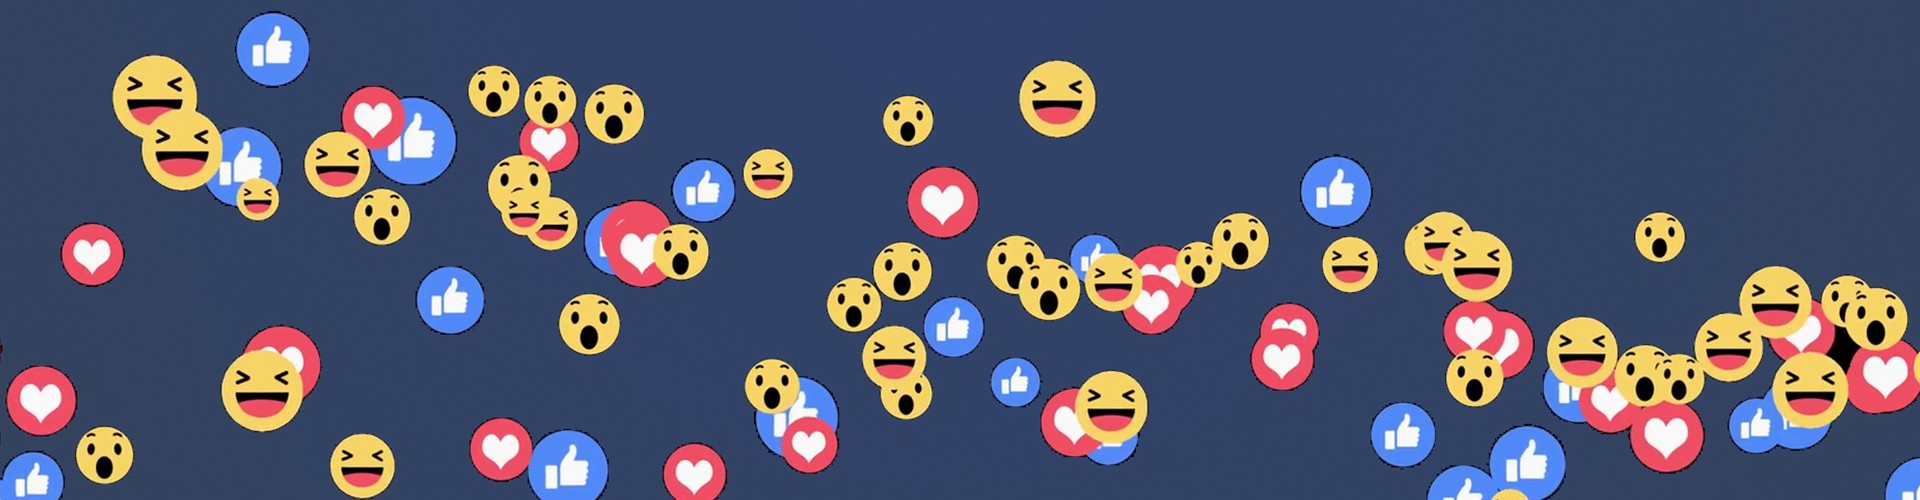 Facebook-emoji-icone-graphisme-reseaux-sociaux